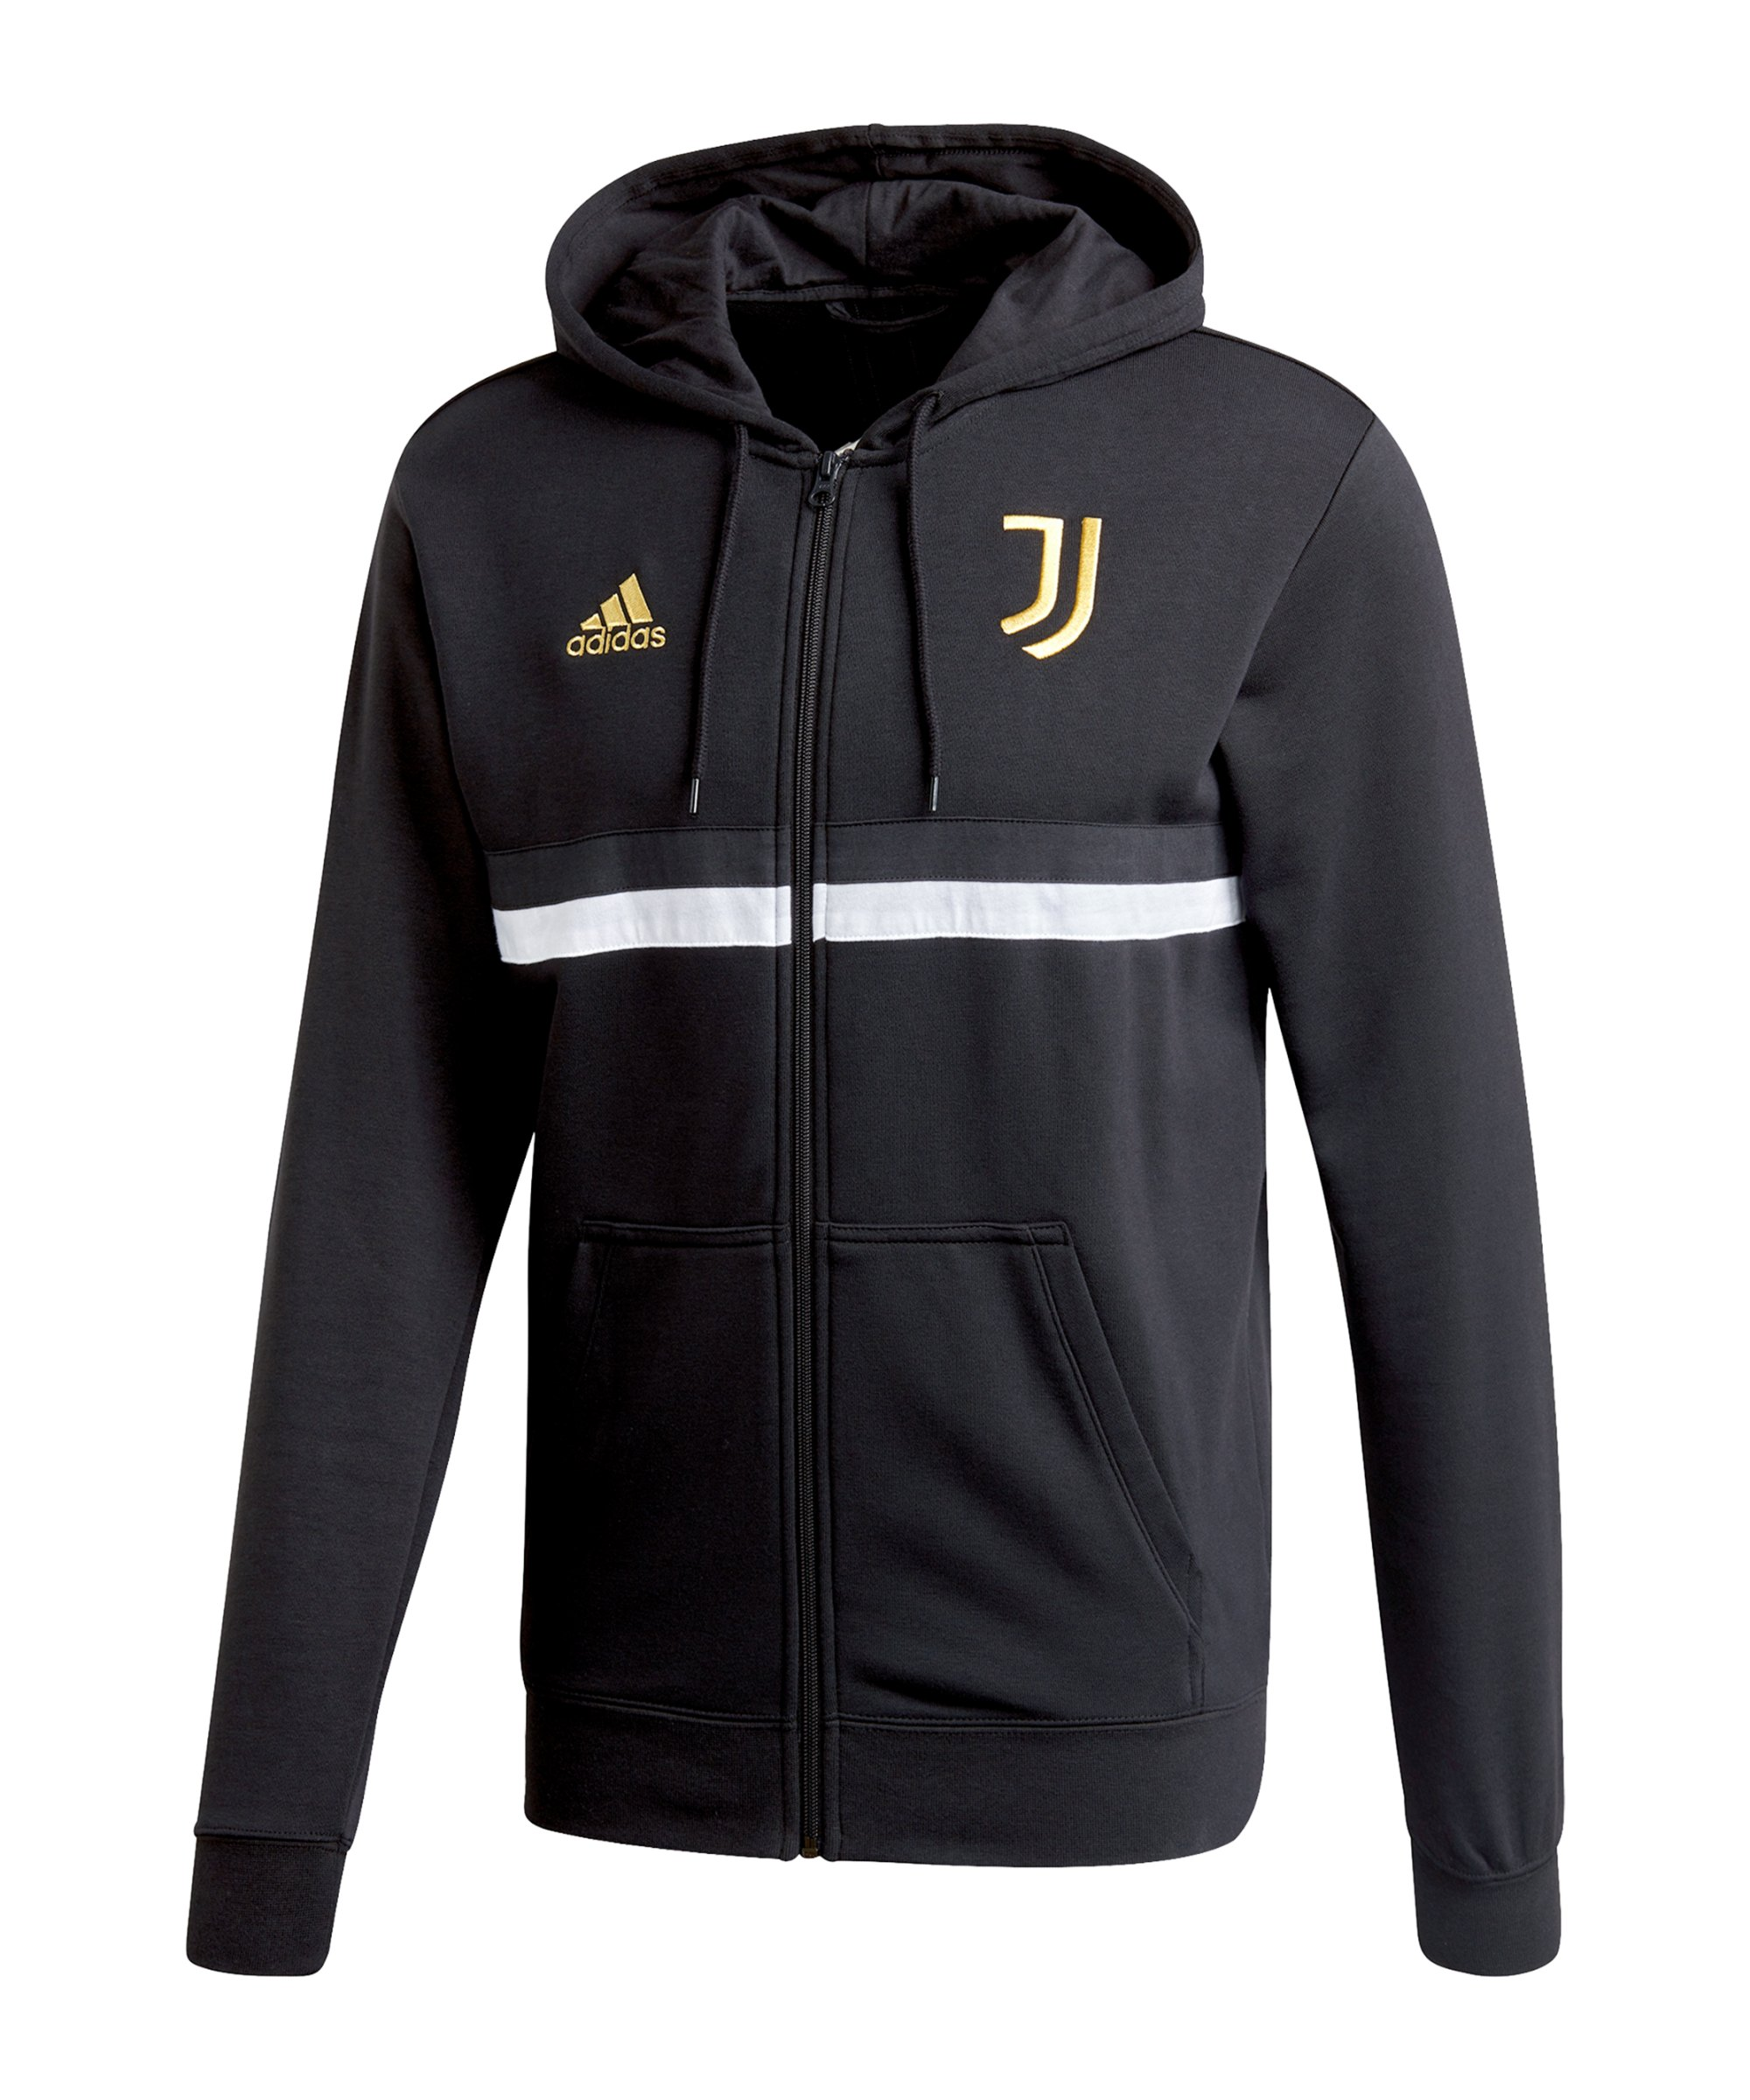 adidas Juventus Turin 3S Kapuzenjacke Schwarz - schwarz